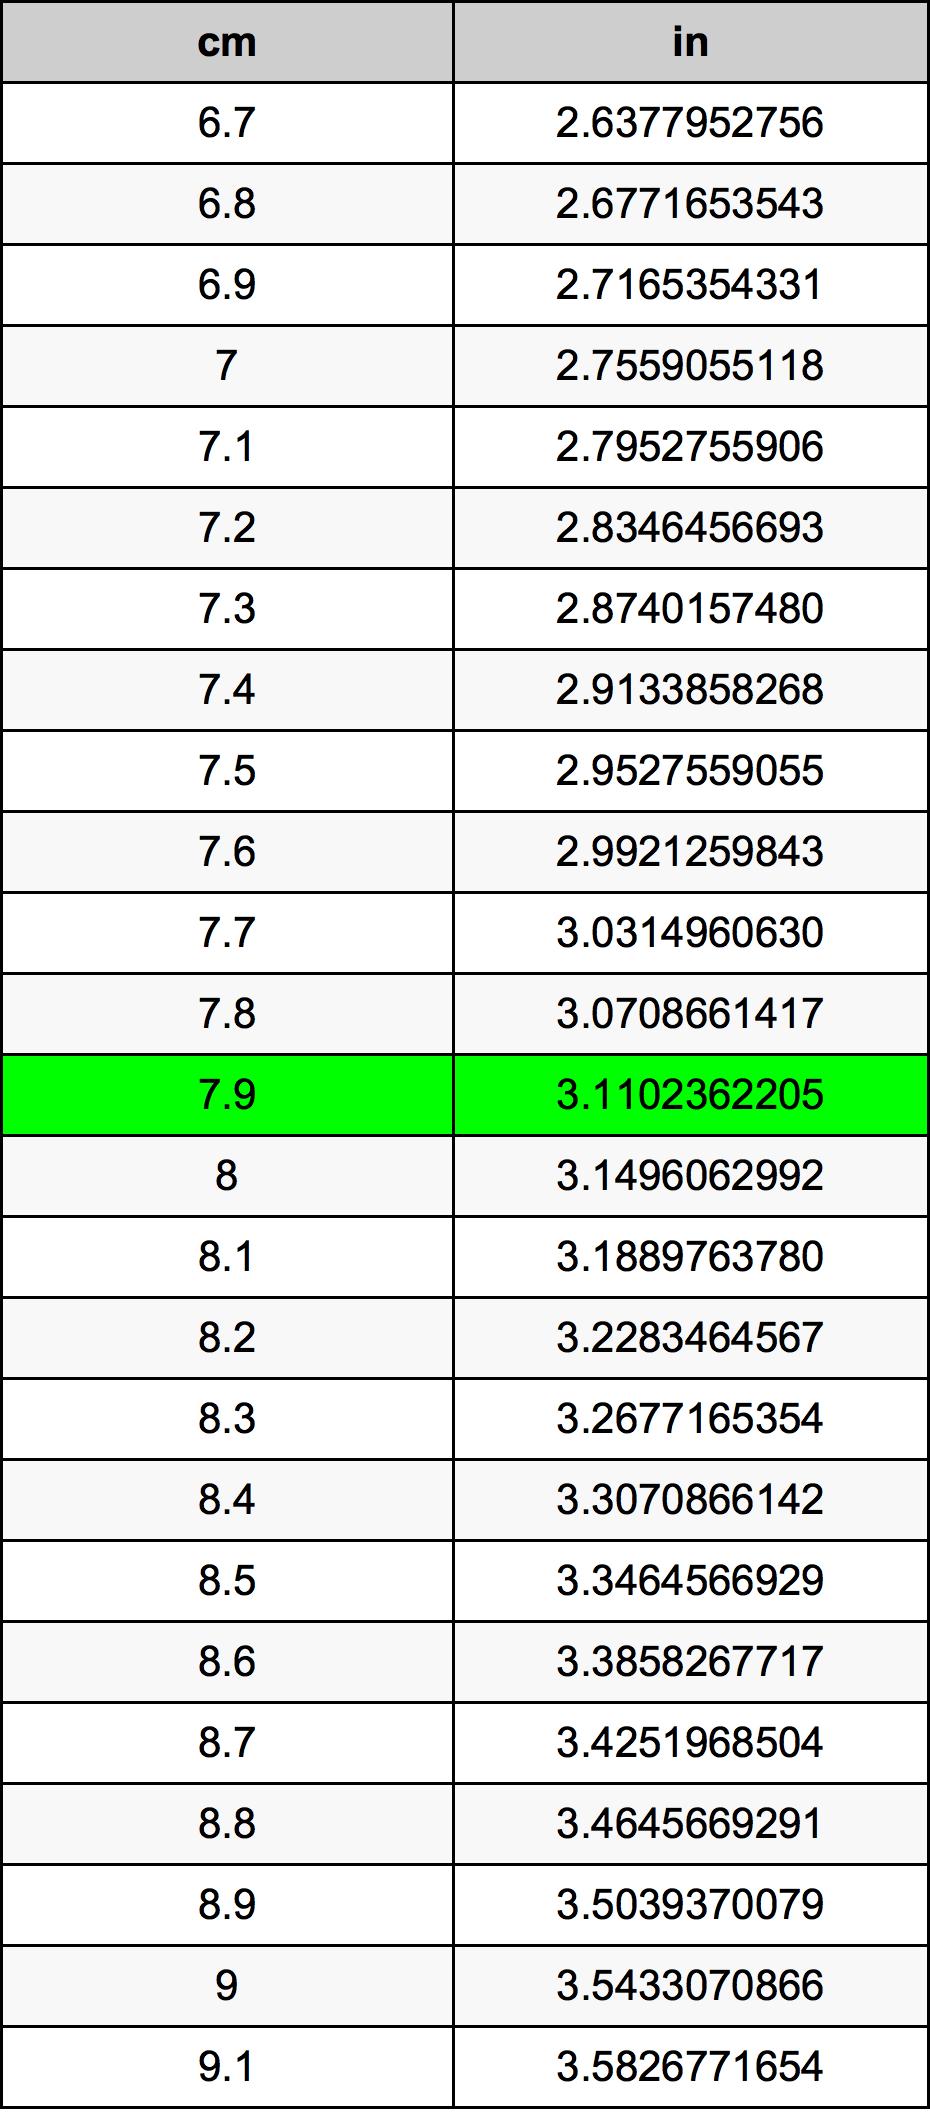 7.9 Centimeter konverteringstabellen